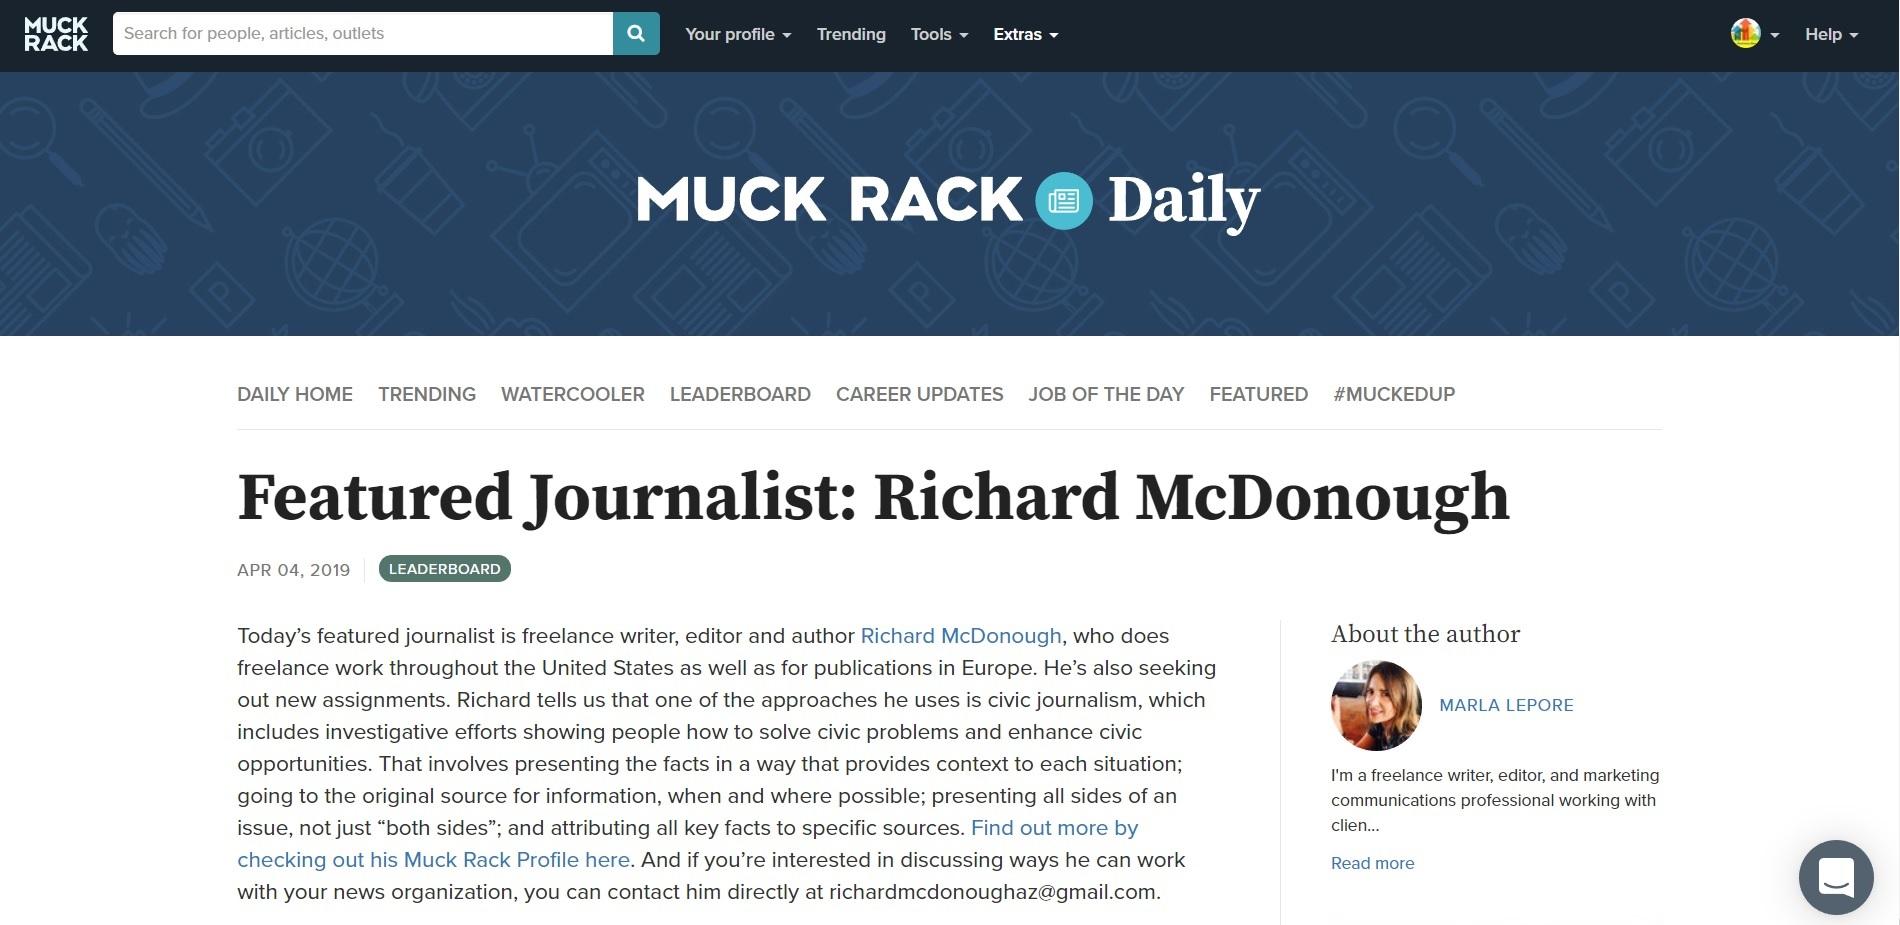 Muck Rack Daily - Feature.jpg